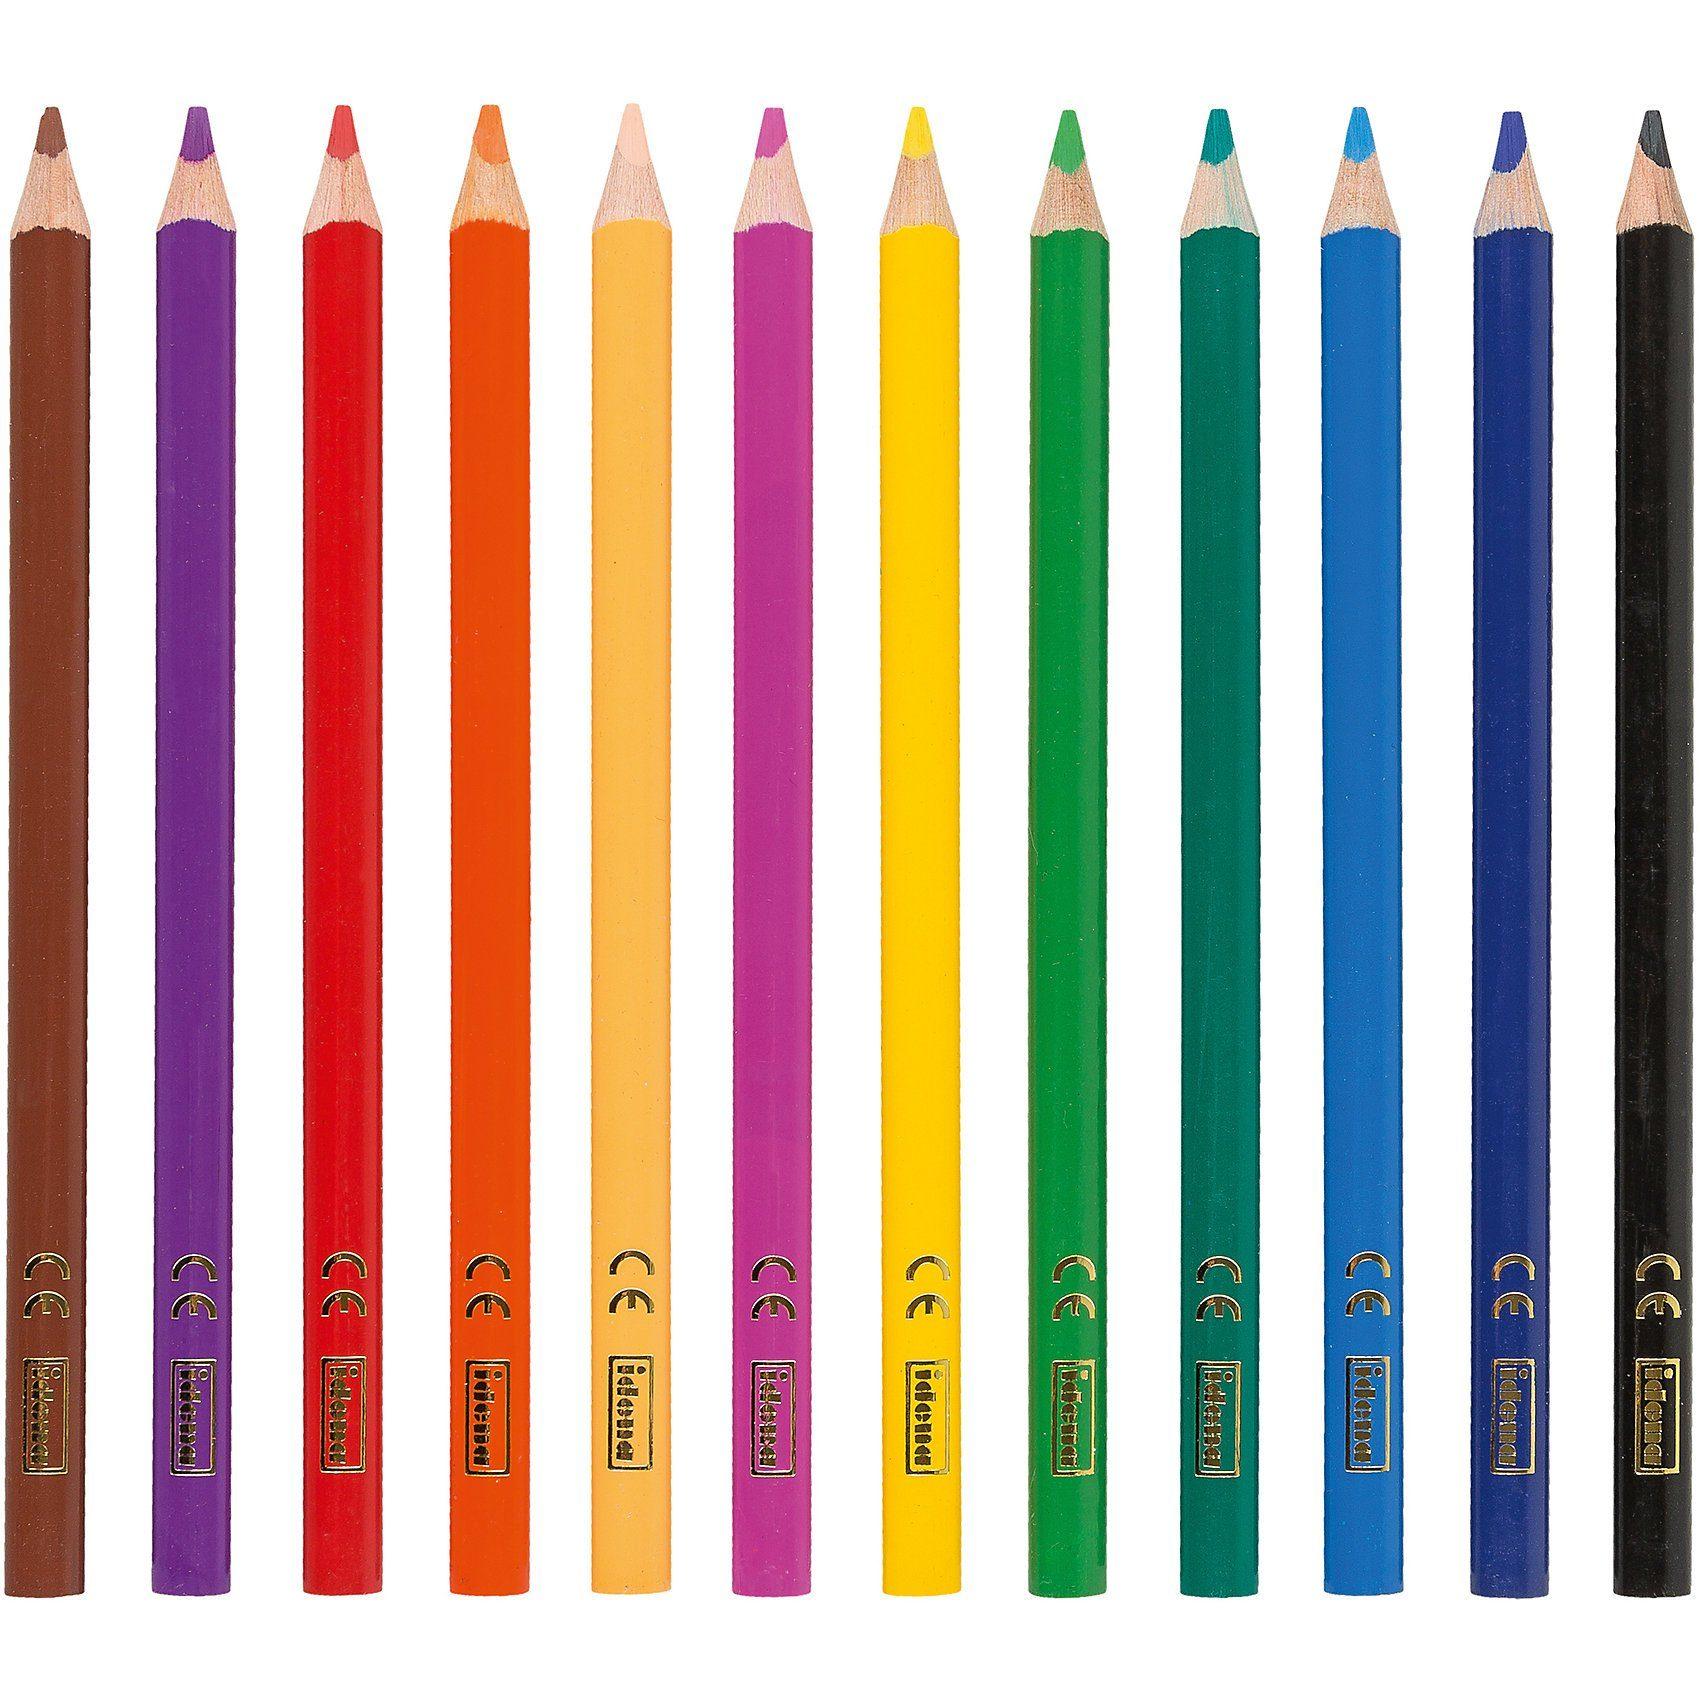 Idena Buntstifte, 12 Farben